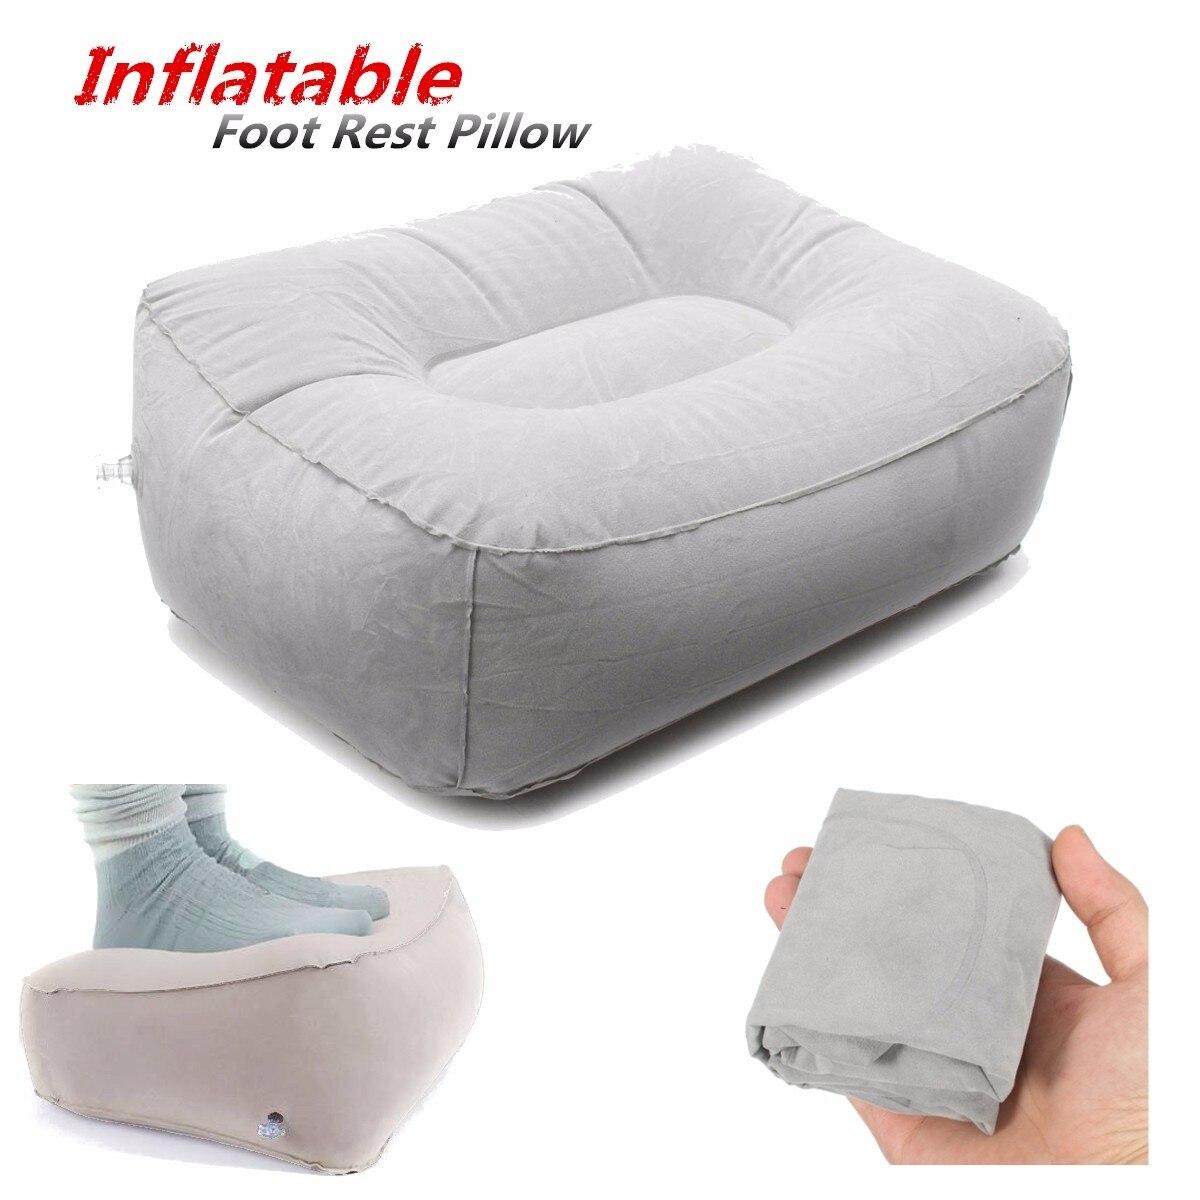 PVC Gray Train Flight Travel Inflatable Foot Rest Pillow Portable ...